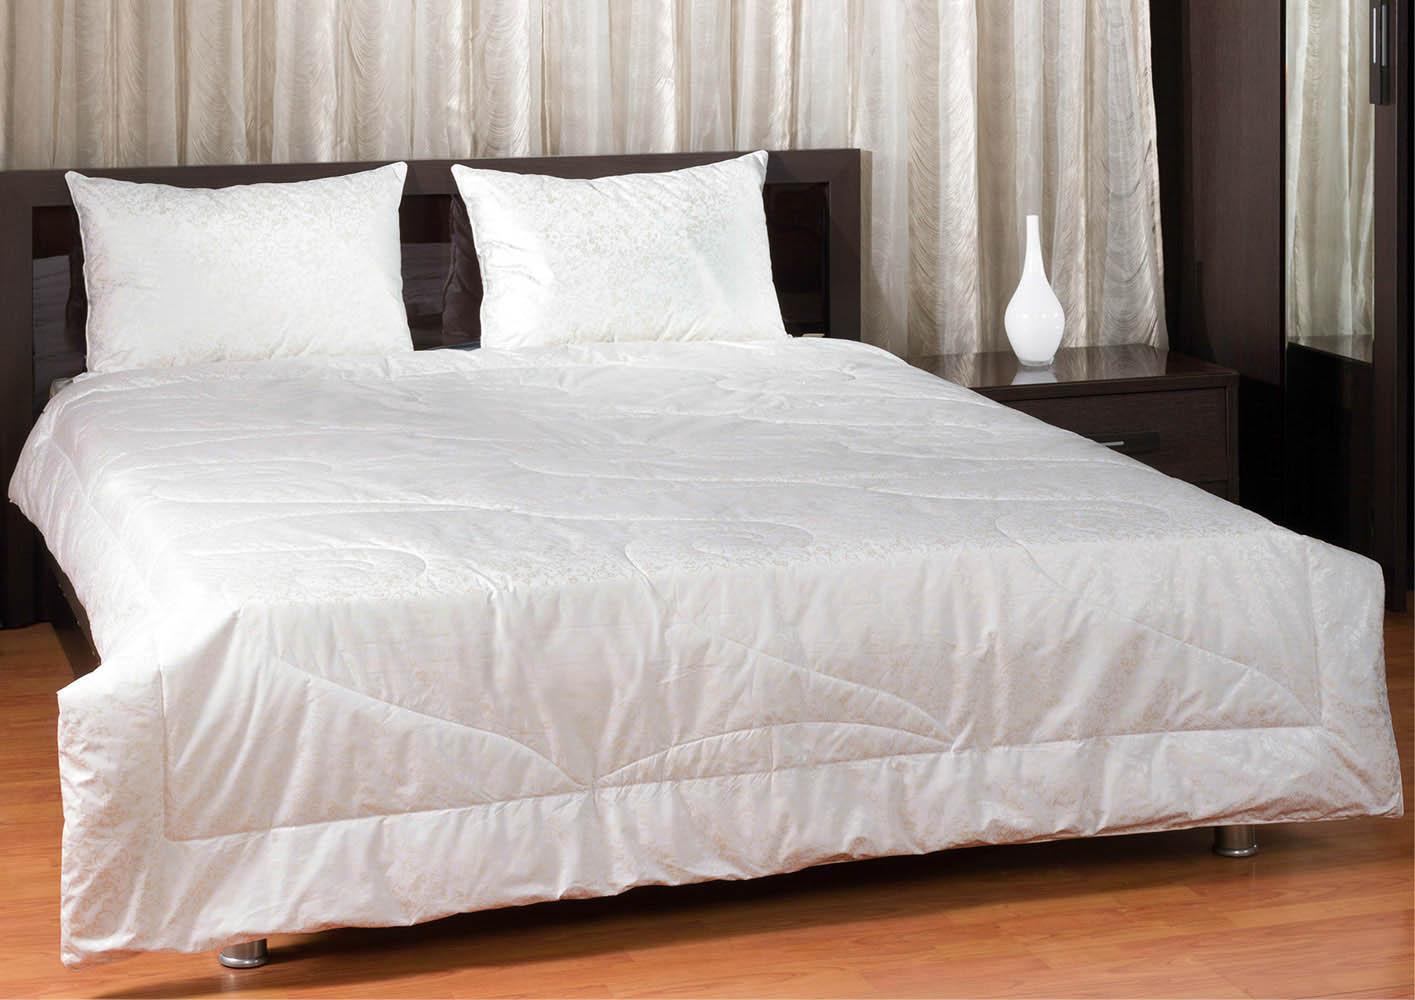 Одеяла Primavelle Одеяло Лебяжий Пух Цвет: Белый (140х205 см)